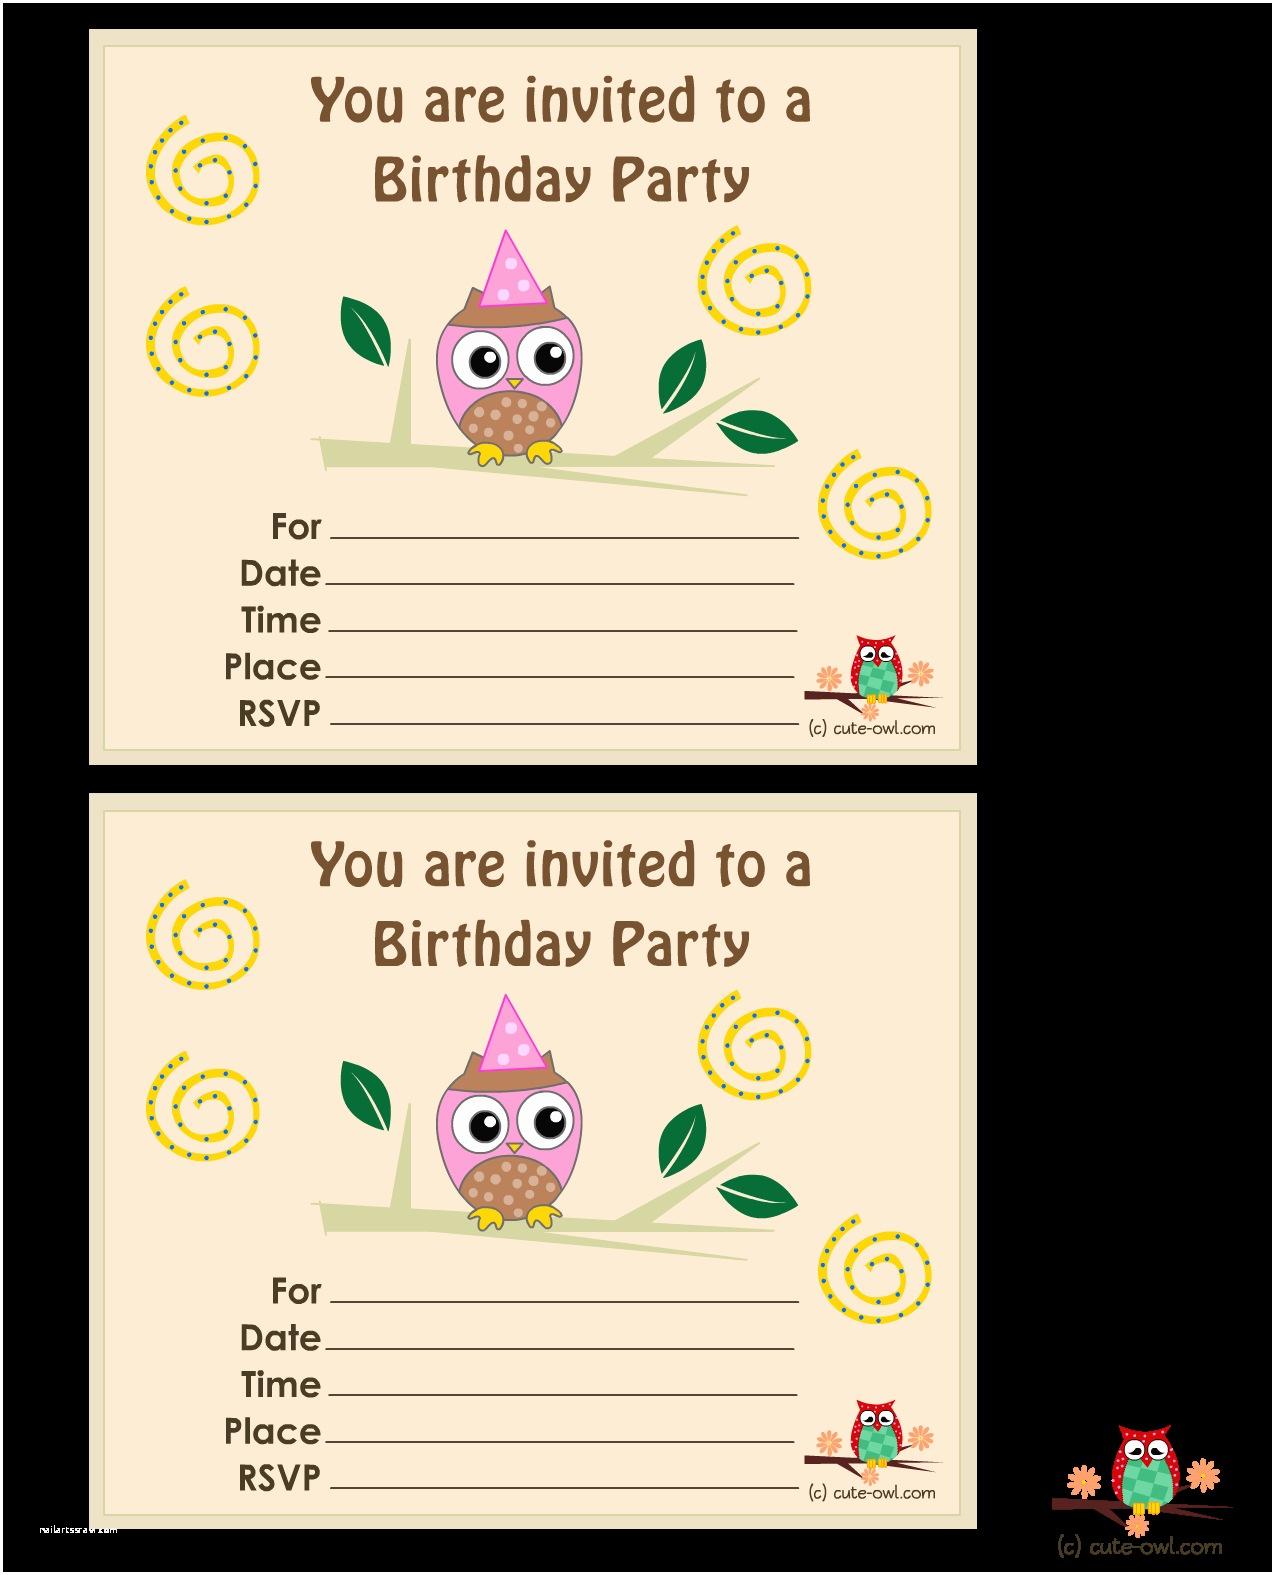 Printable Birthday Party Invitations Free Owl